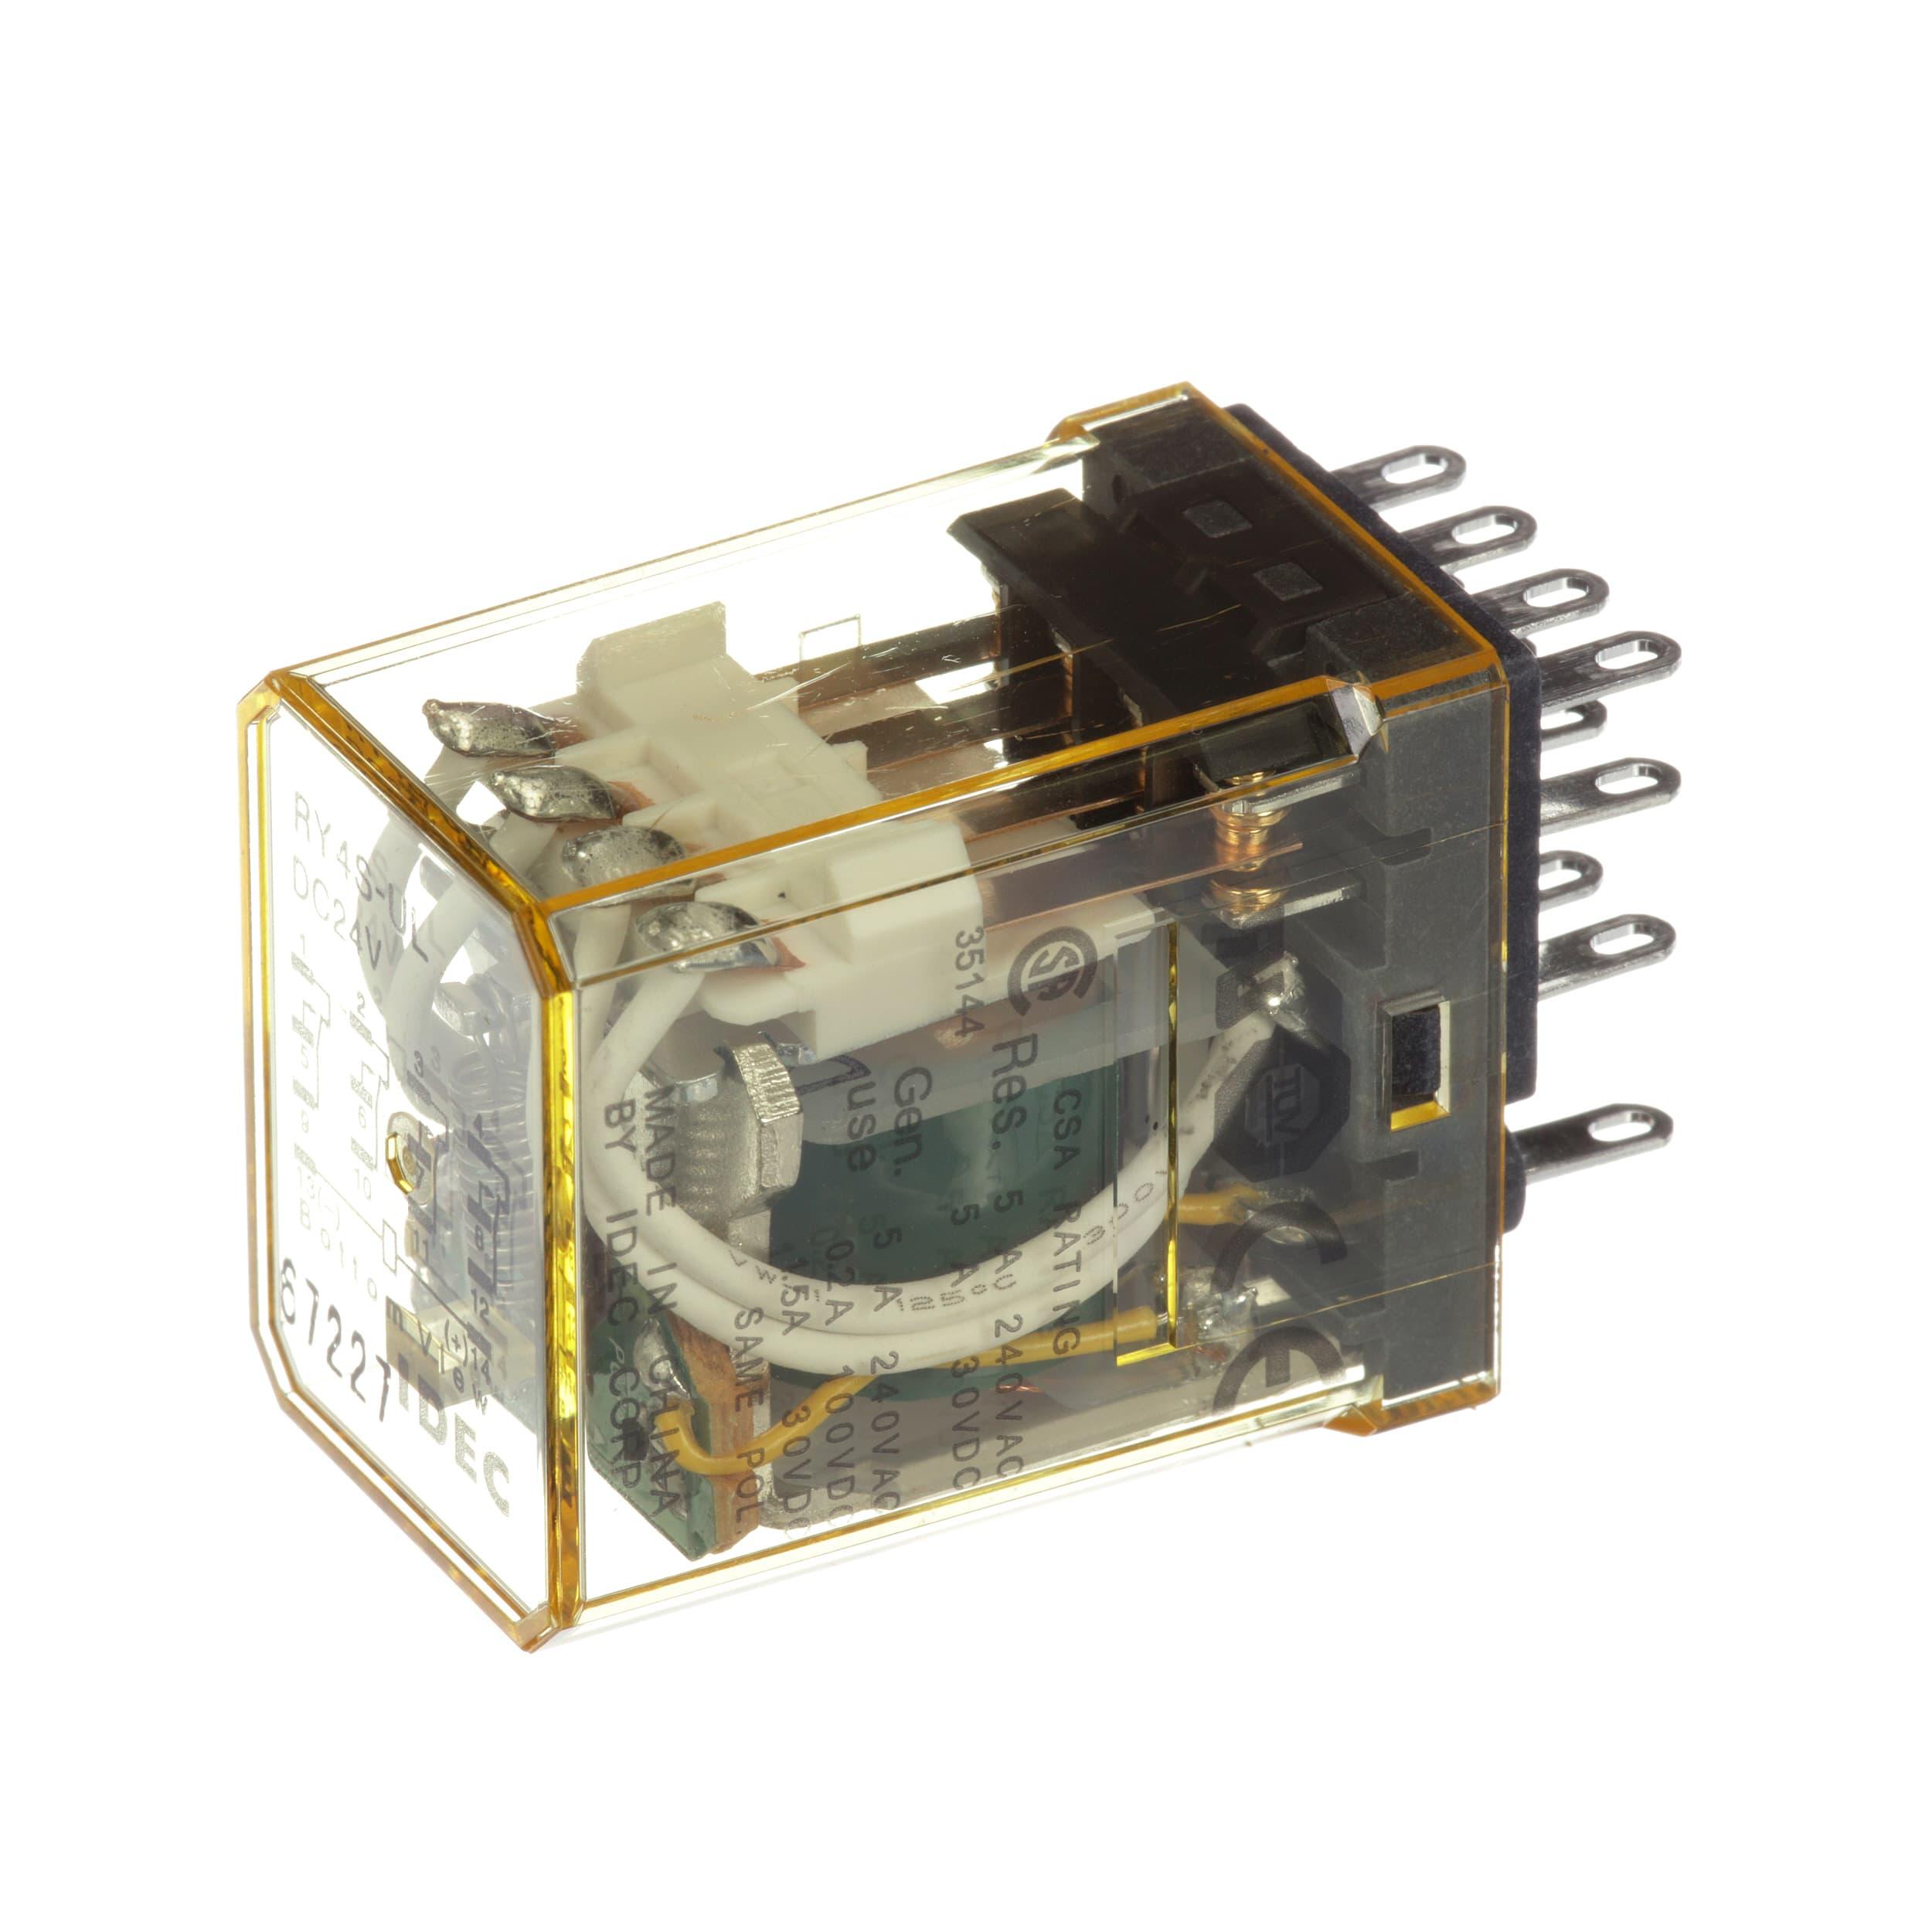 IDEC Corporation - RY4S-ULDC24V - Relay; E-Mech; Gen Purp; 4PDT; Cur-Rtg  5A; Ctrl-V 24DC; Vol-Rtg 240AC; Plug-In/Solder - Allied Electronics &  Automation